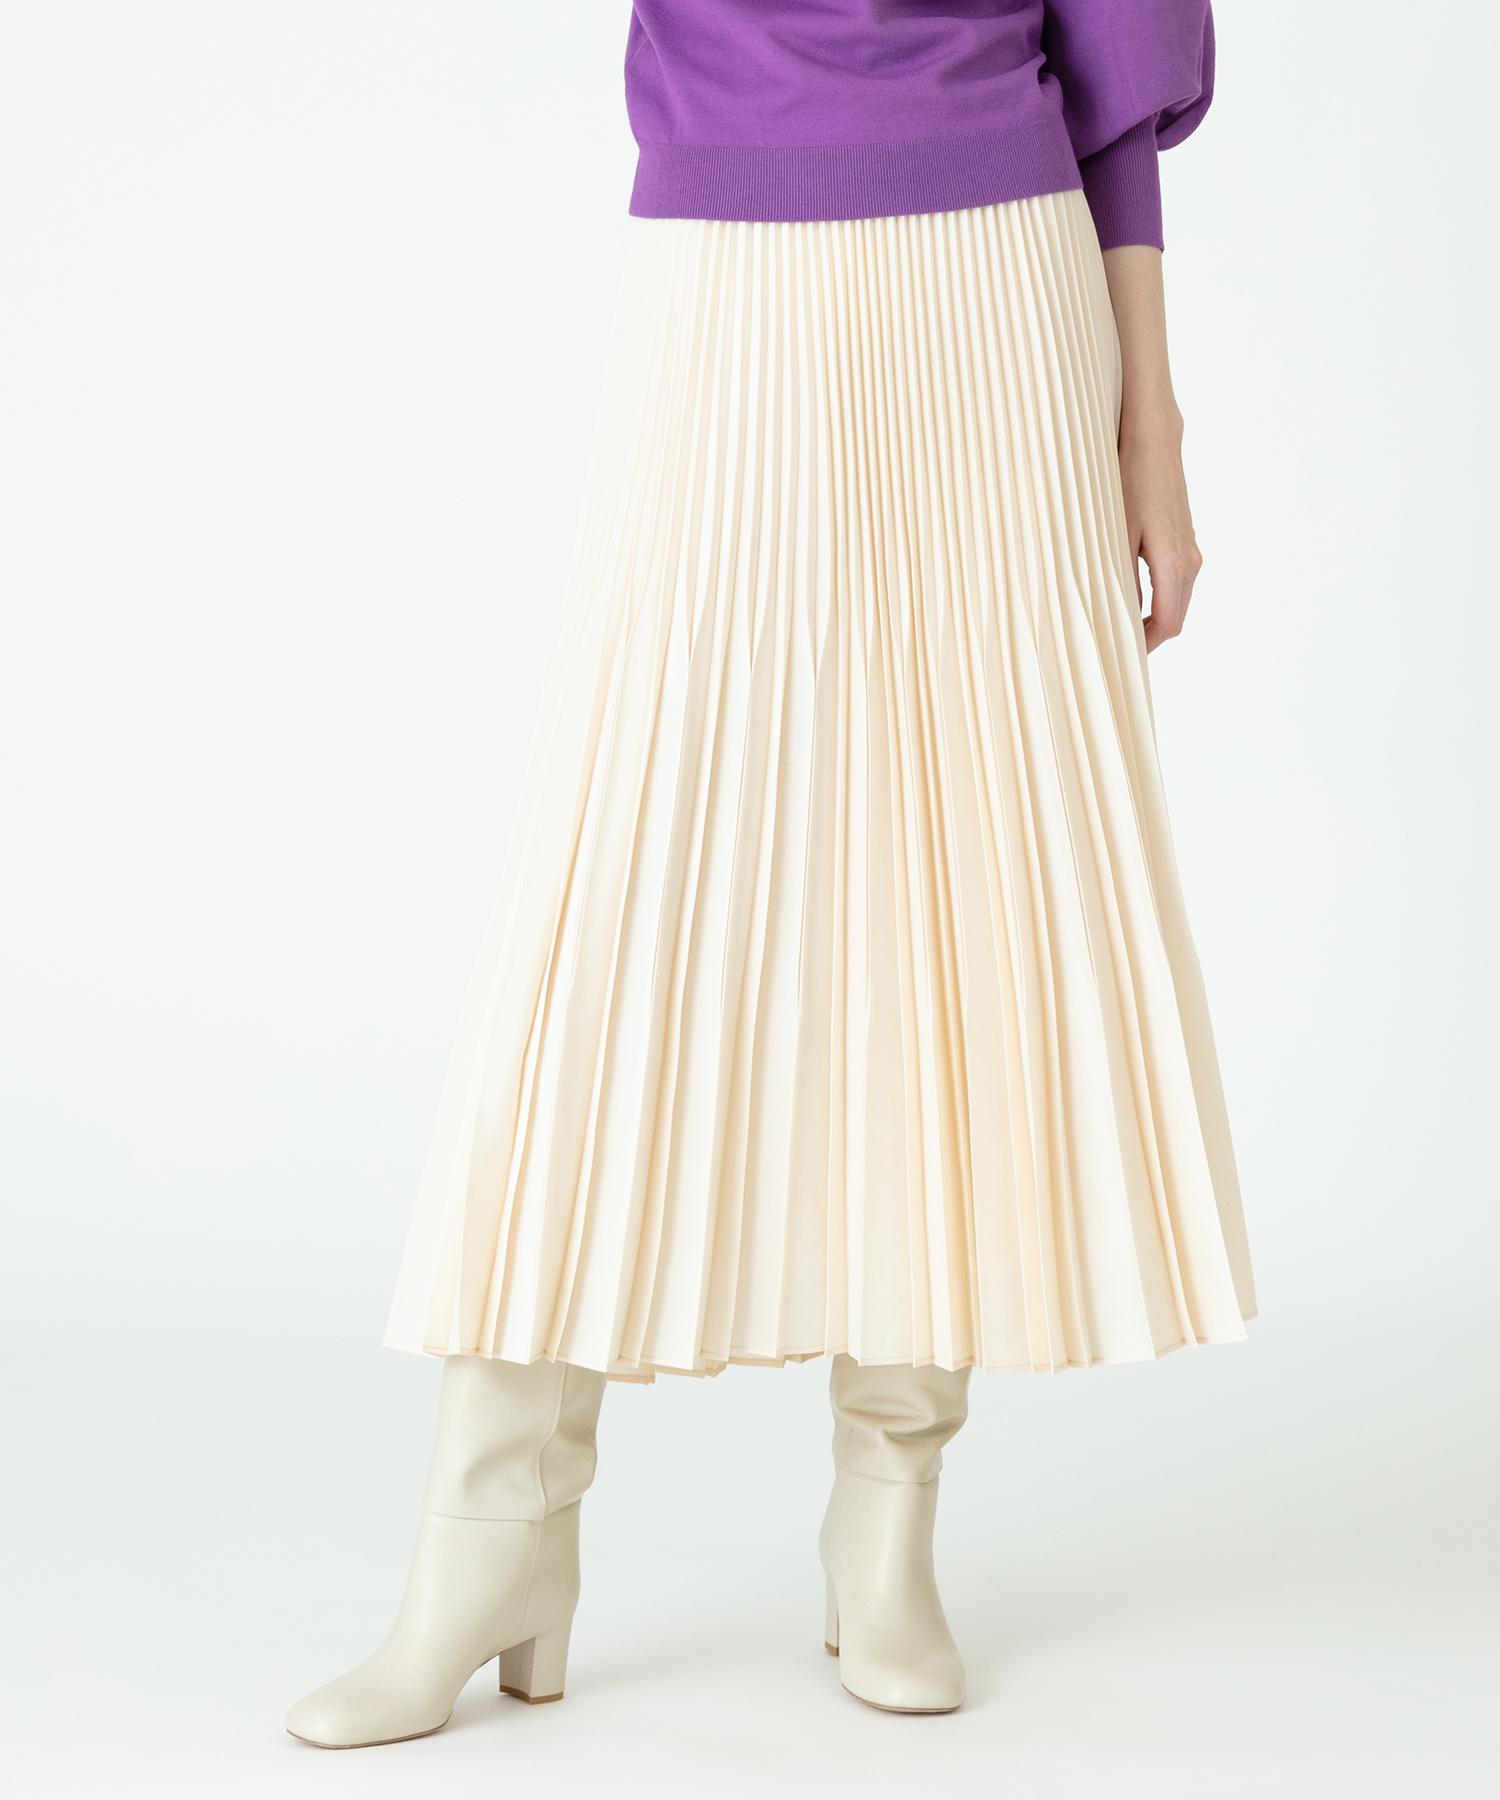 【Loulou Willoughby】ビンテージタフタプリーツスカート